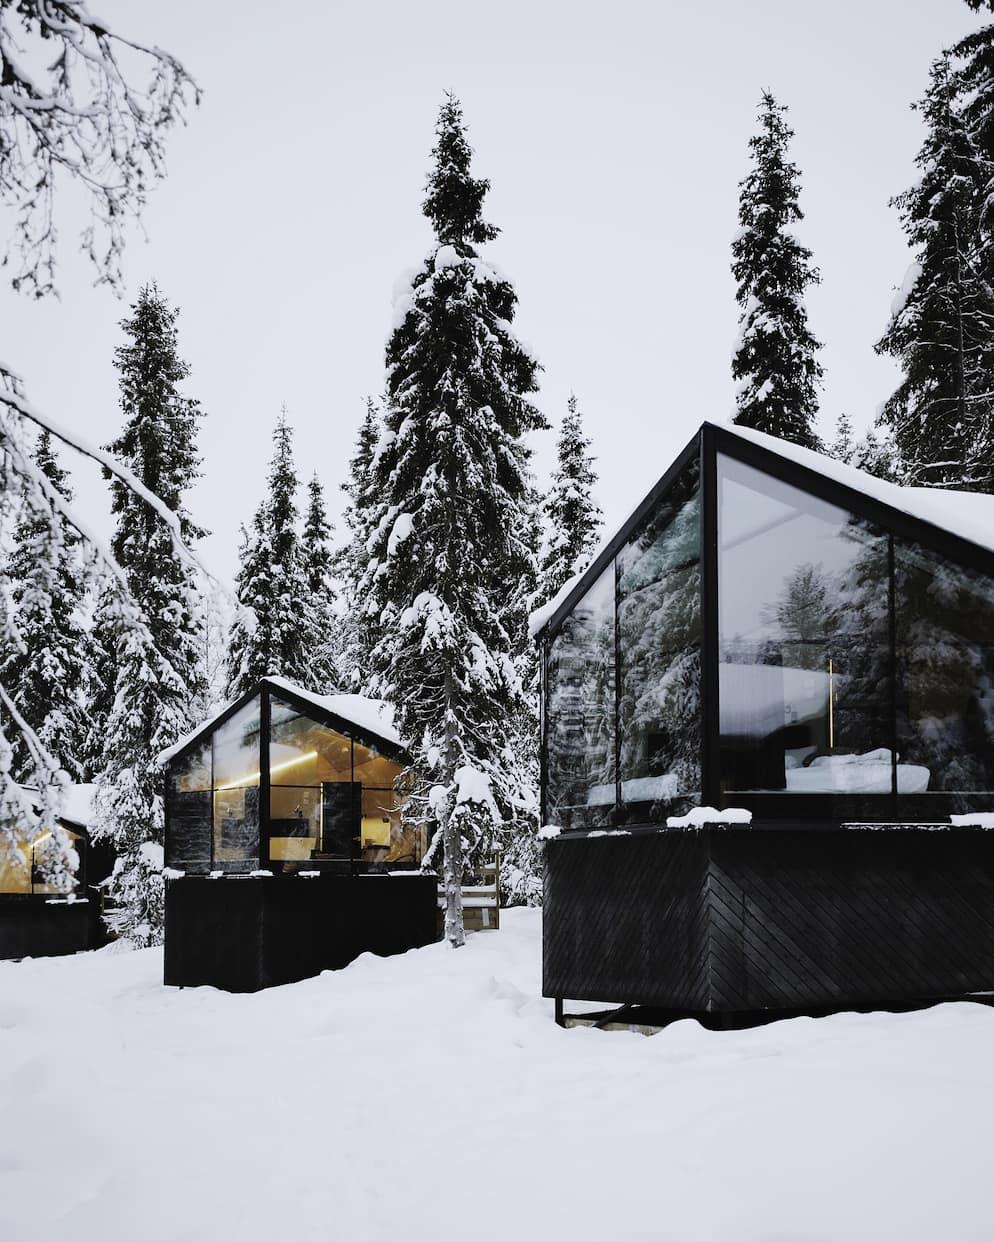 Woodio reference - Magical Pond Igloo Village in Kuusamo Finland